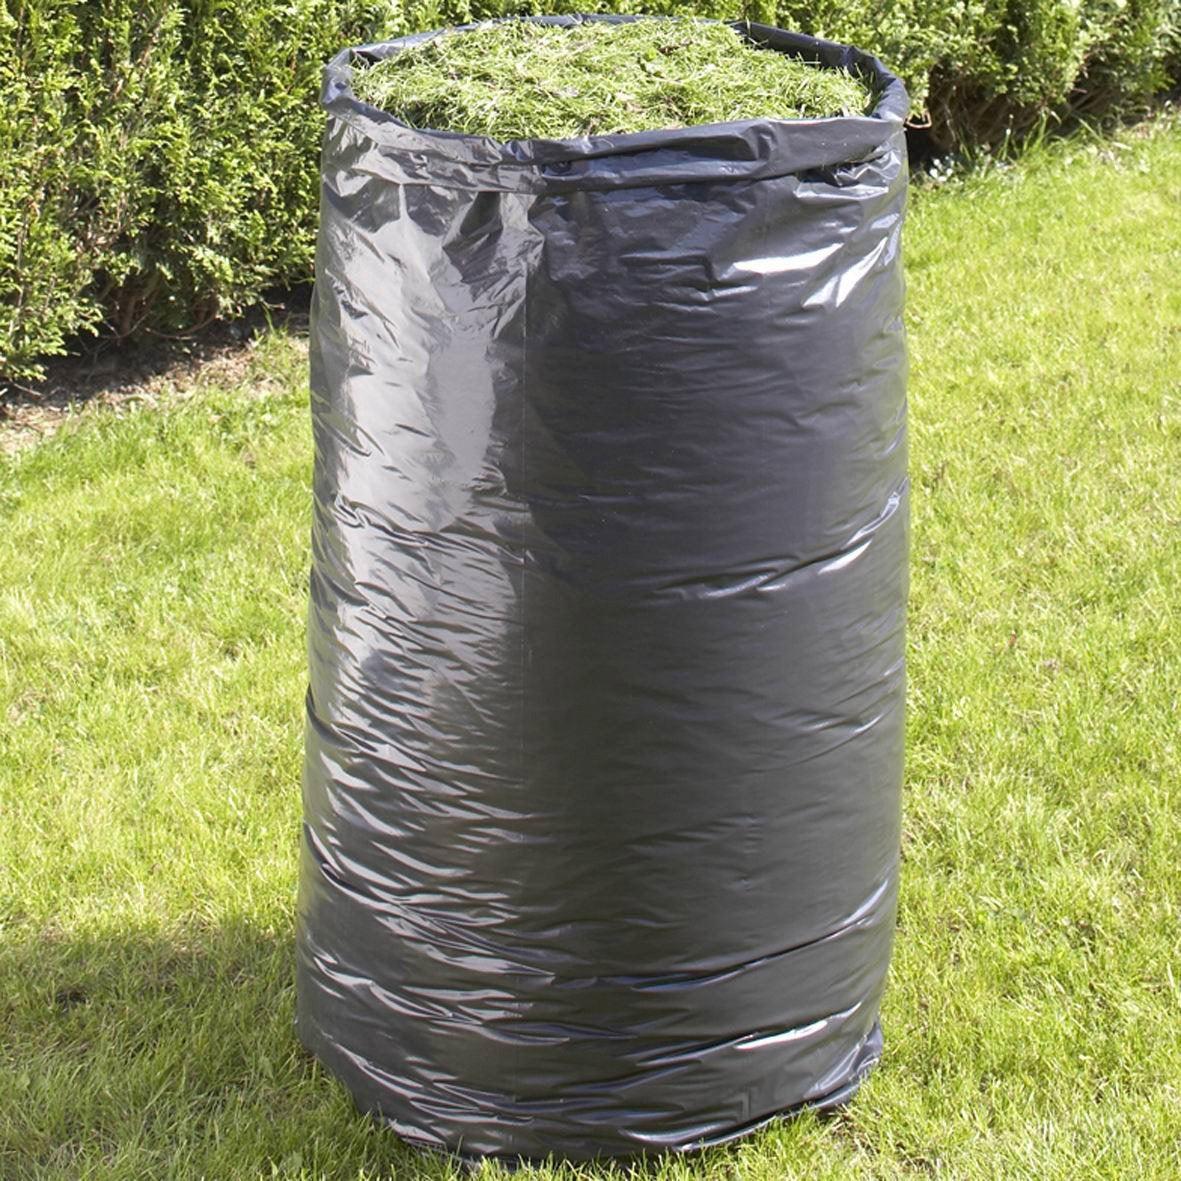 lot de 10 sacs jetables de jardin geolia 100 l leroy merlin. Black Bedroom Furniture Sets. Home Design Ideas